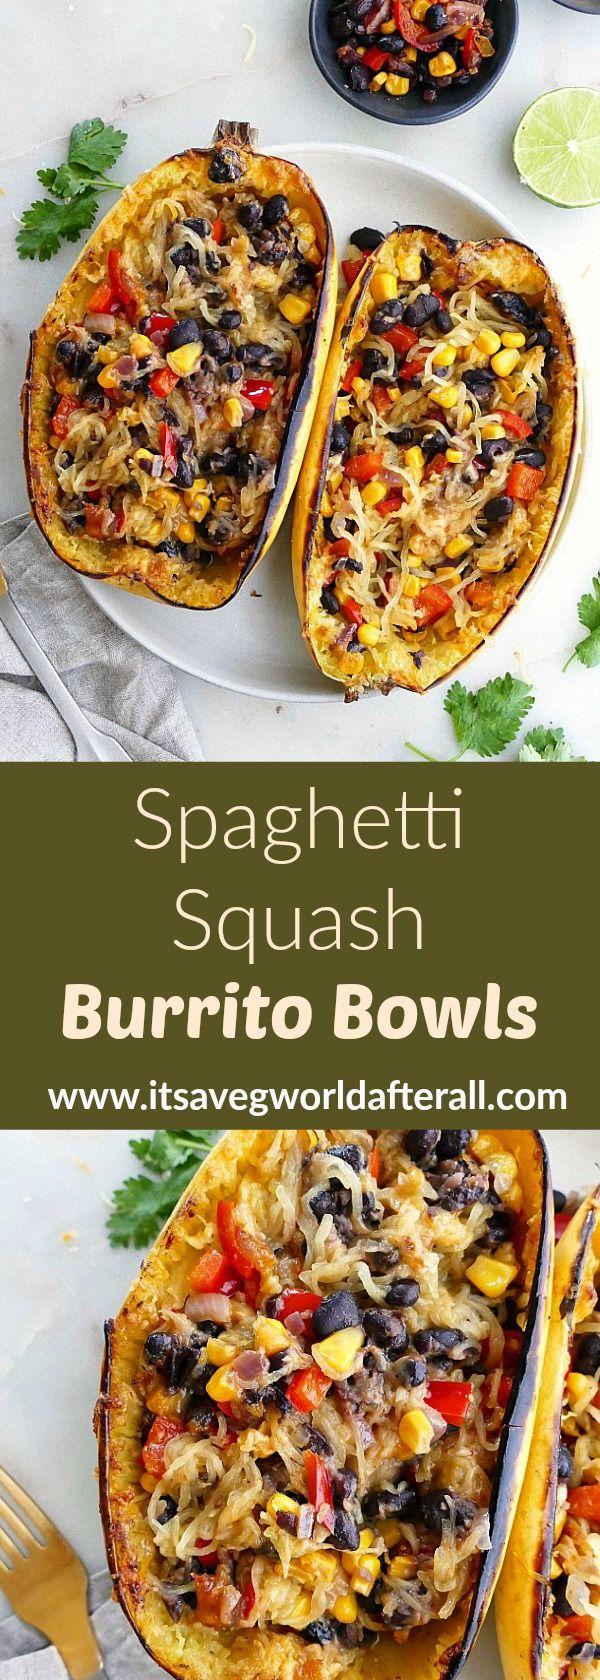 Spaghetti Squash Burrito Bowls - It's a Veg World After All®